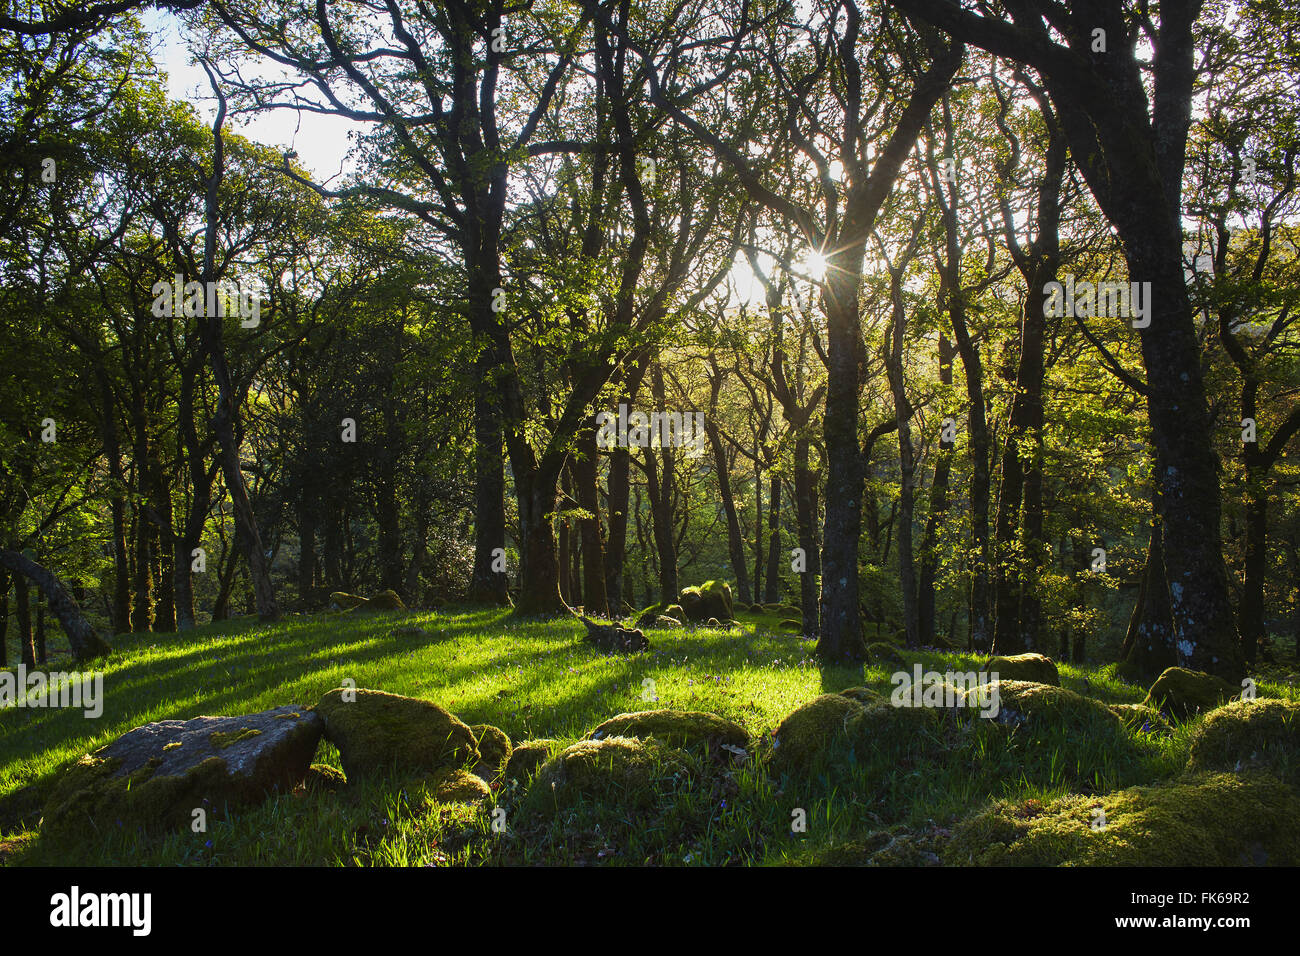 Ancient oak woodland in the Dart Valley, near Dartmeet, Dartmoor National Park, Devon, England, United Kingdom, - Stock Image